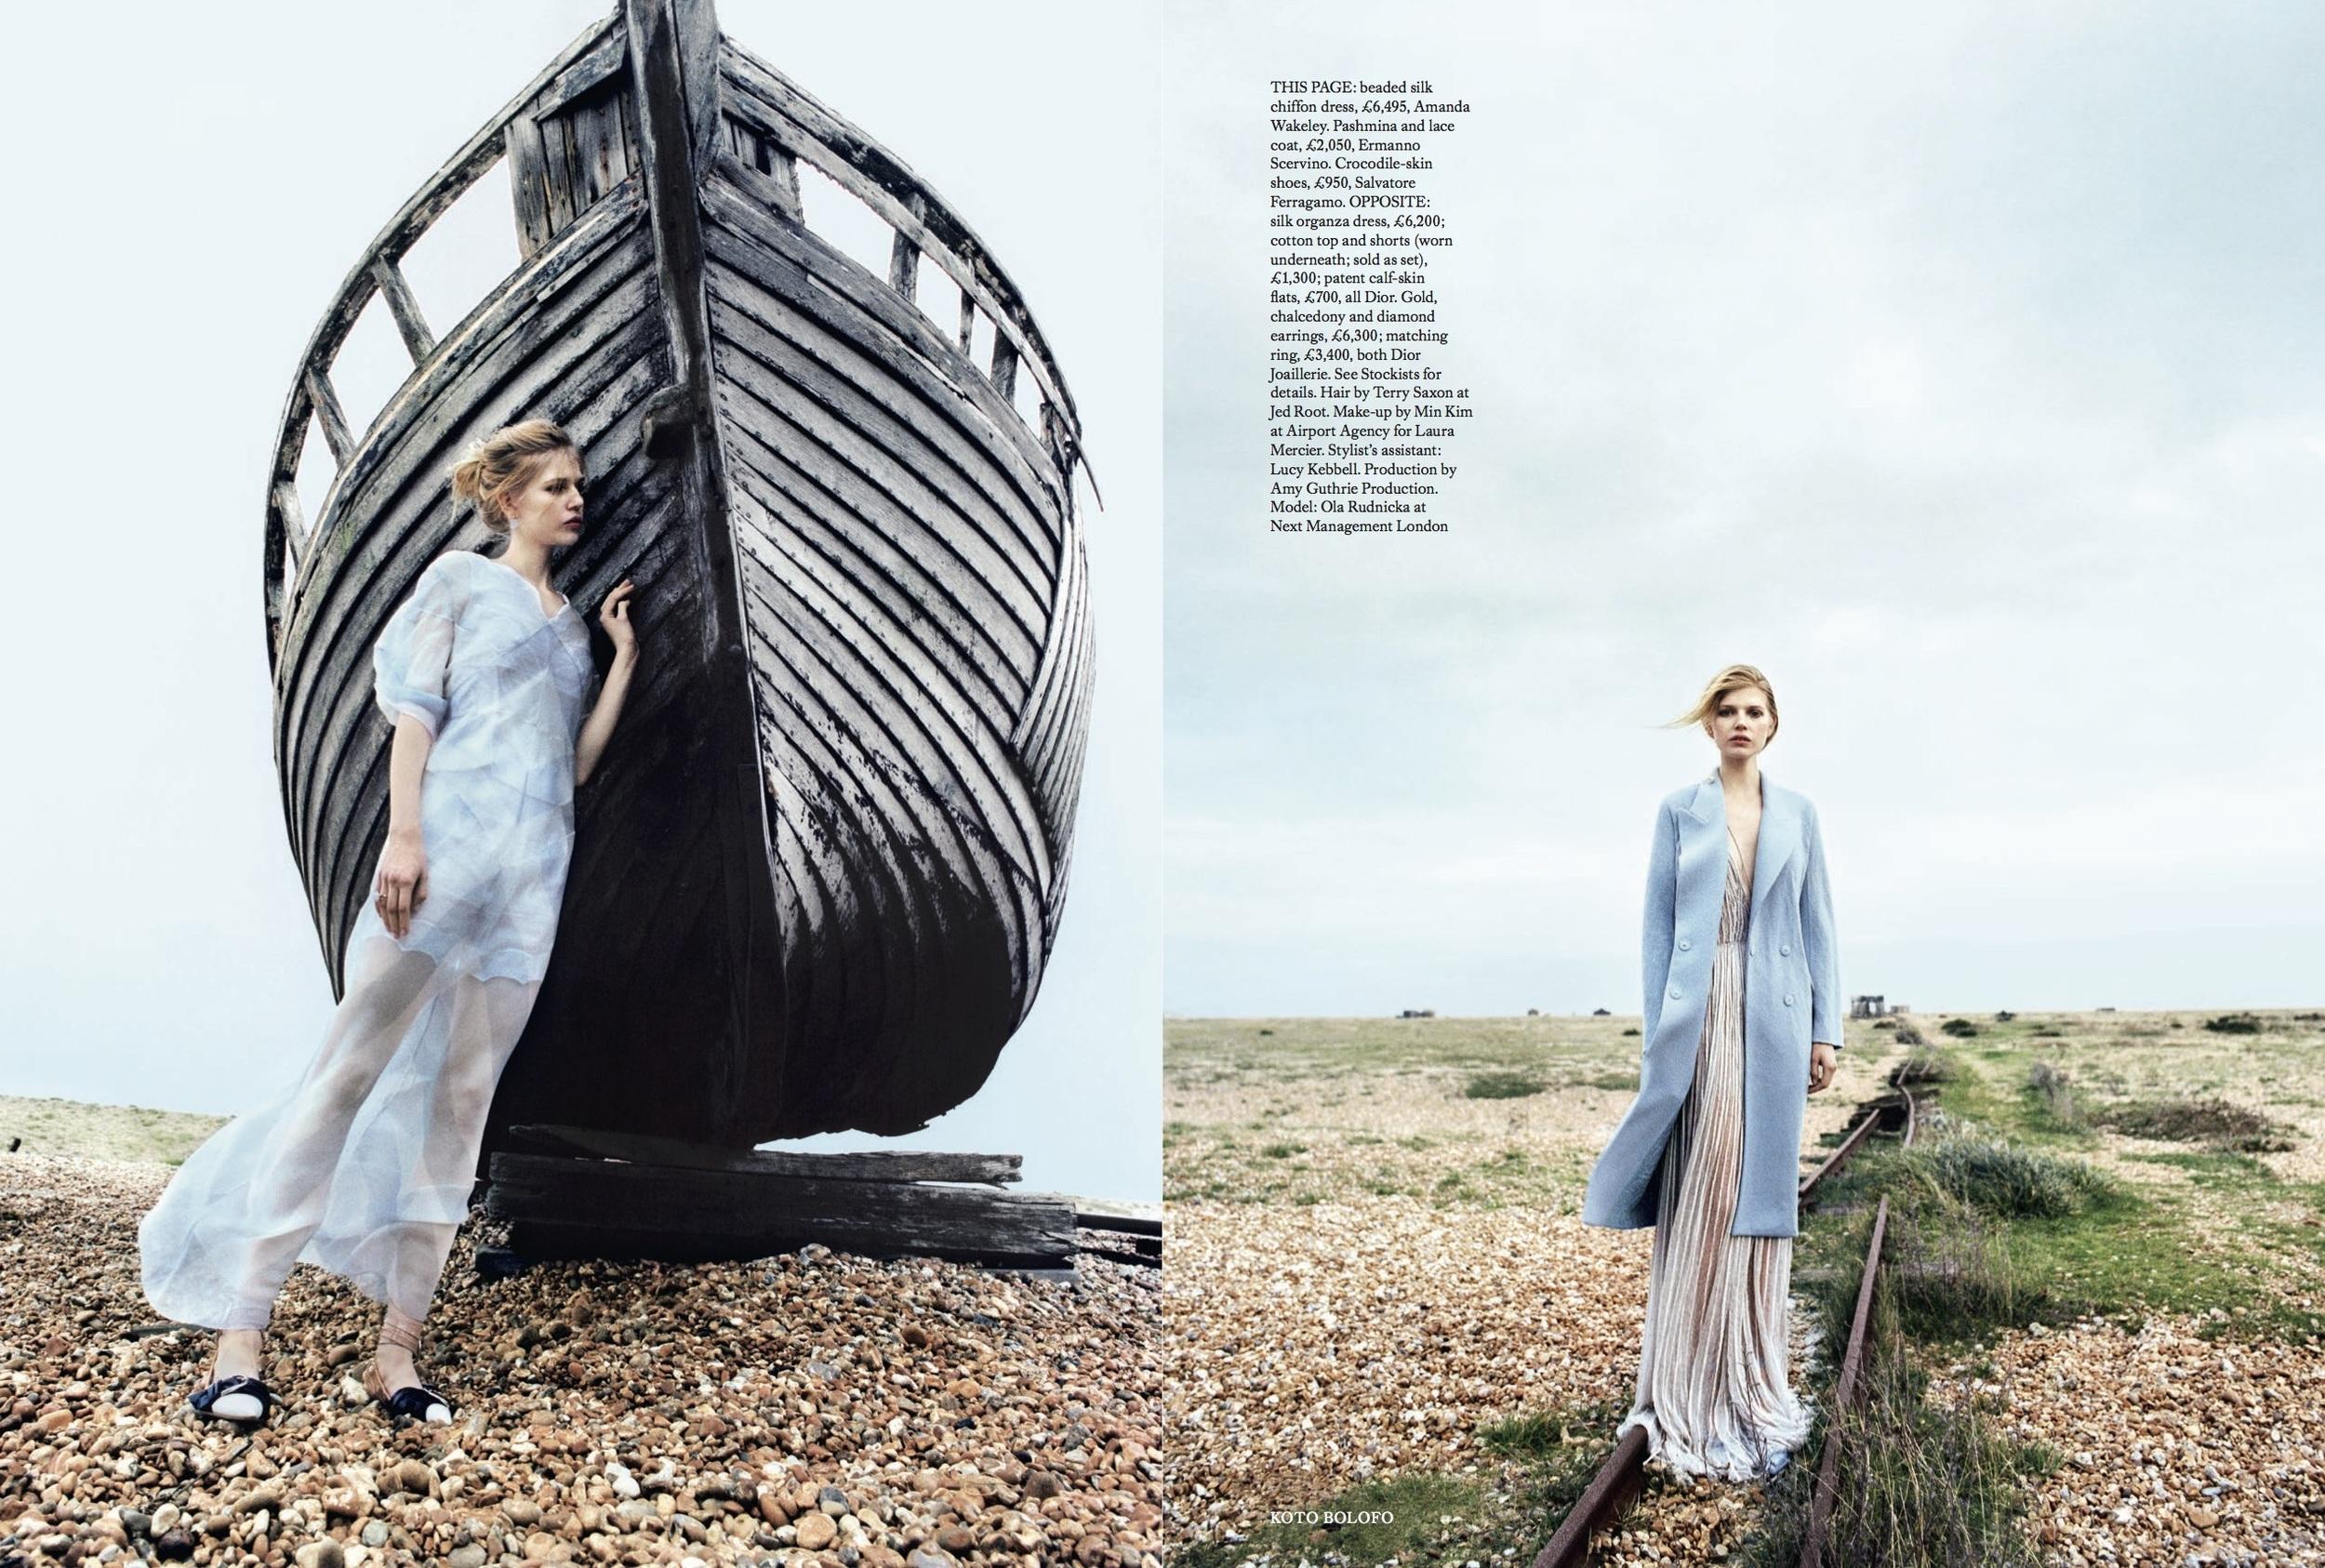 Ola Rudnicka Cover Story for Harper's Bazaar, styled by Charlie Harrington. Spread 6.